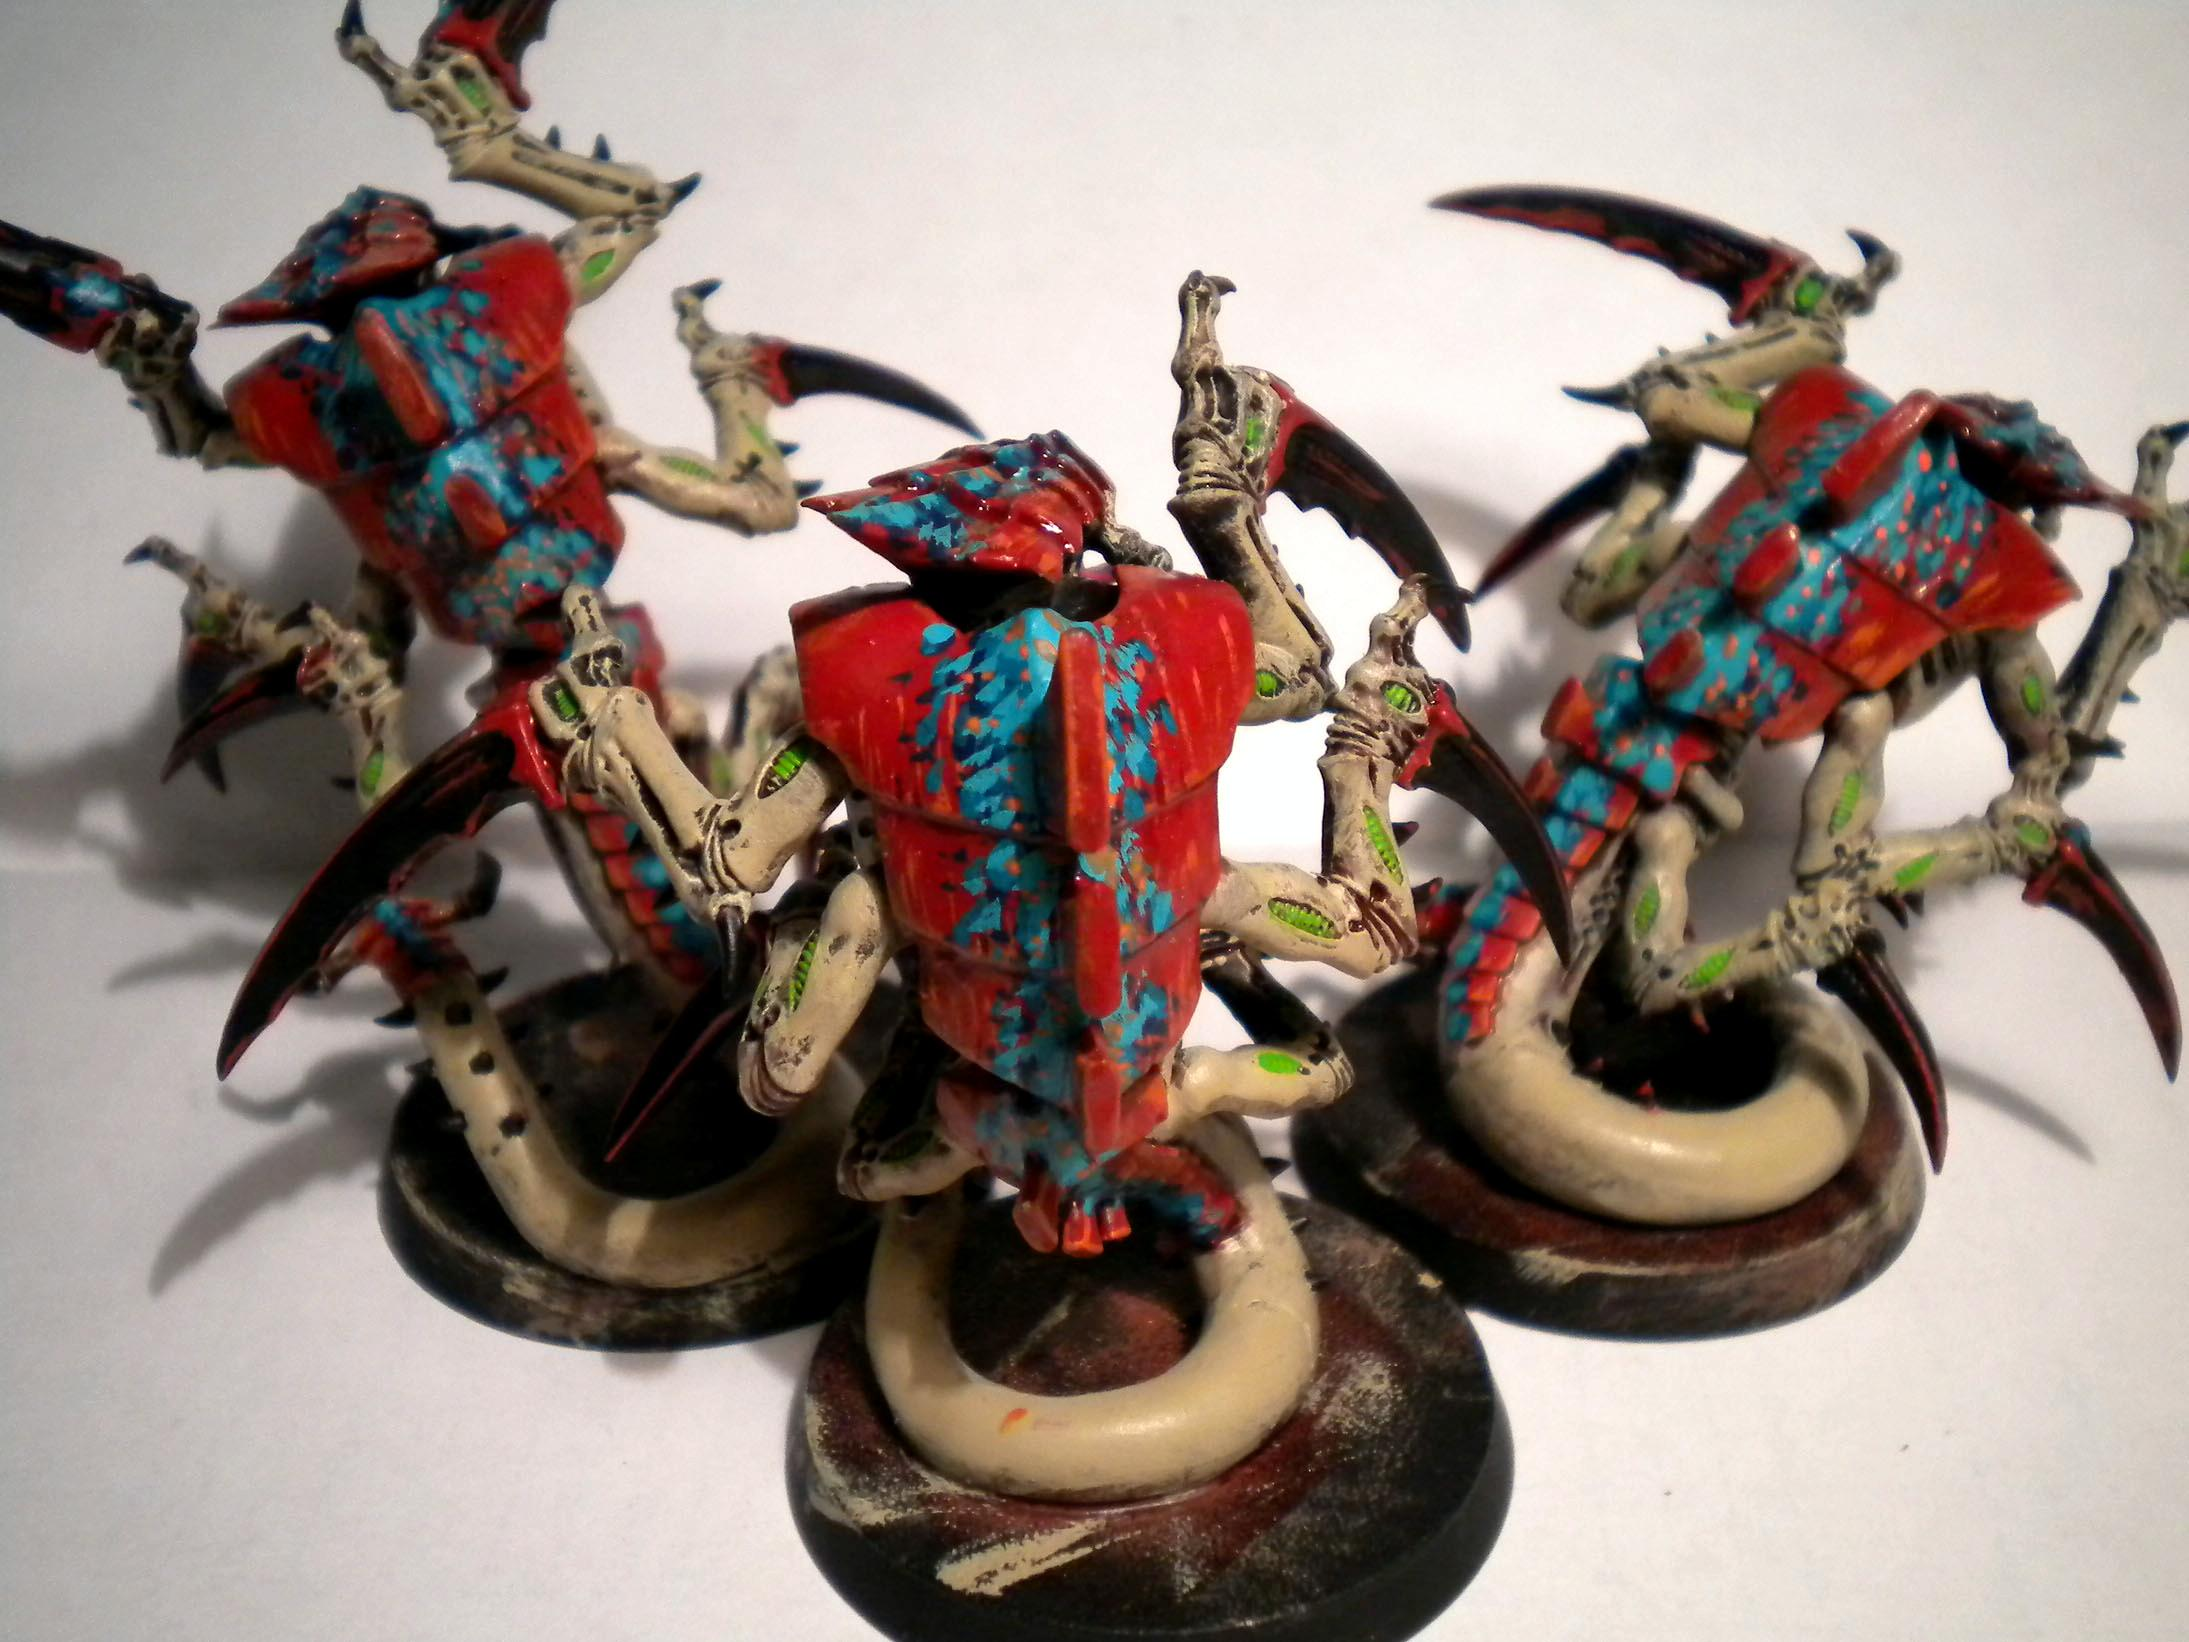 Hive Fleet Kraken, Raveners, Tyranids, Warhammer 40,000, Work In Progress